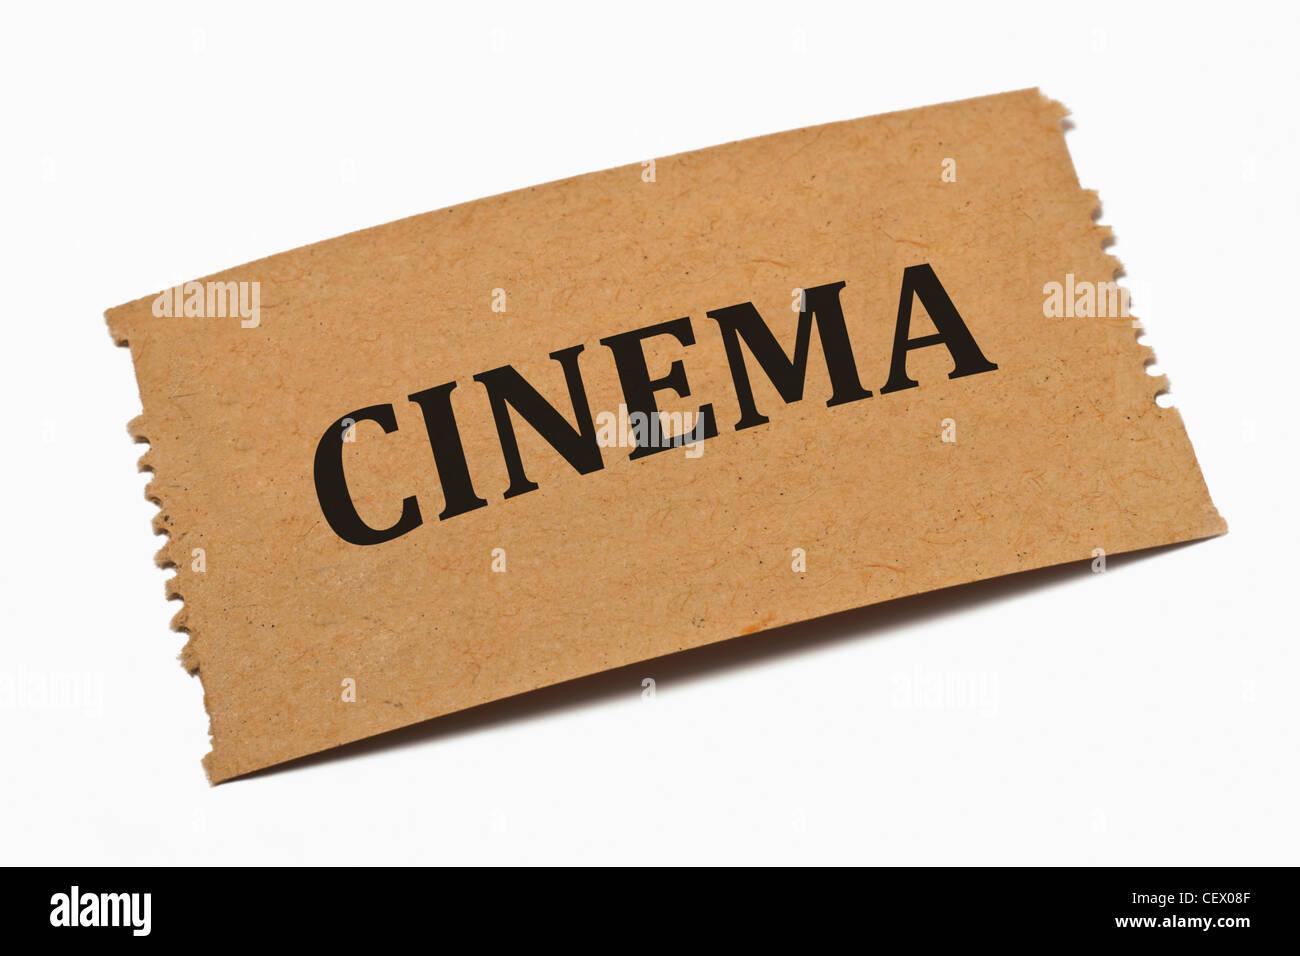 Cinema Ticket Photo Stockfotos & Cinema Ticket Photo Bilder - Alamy